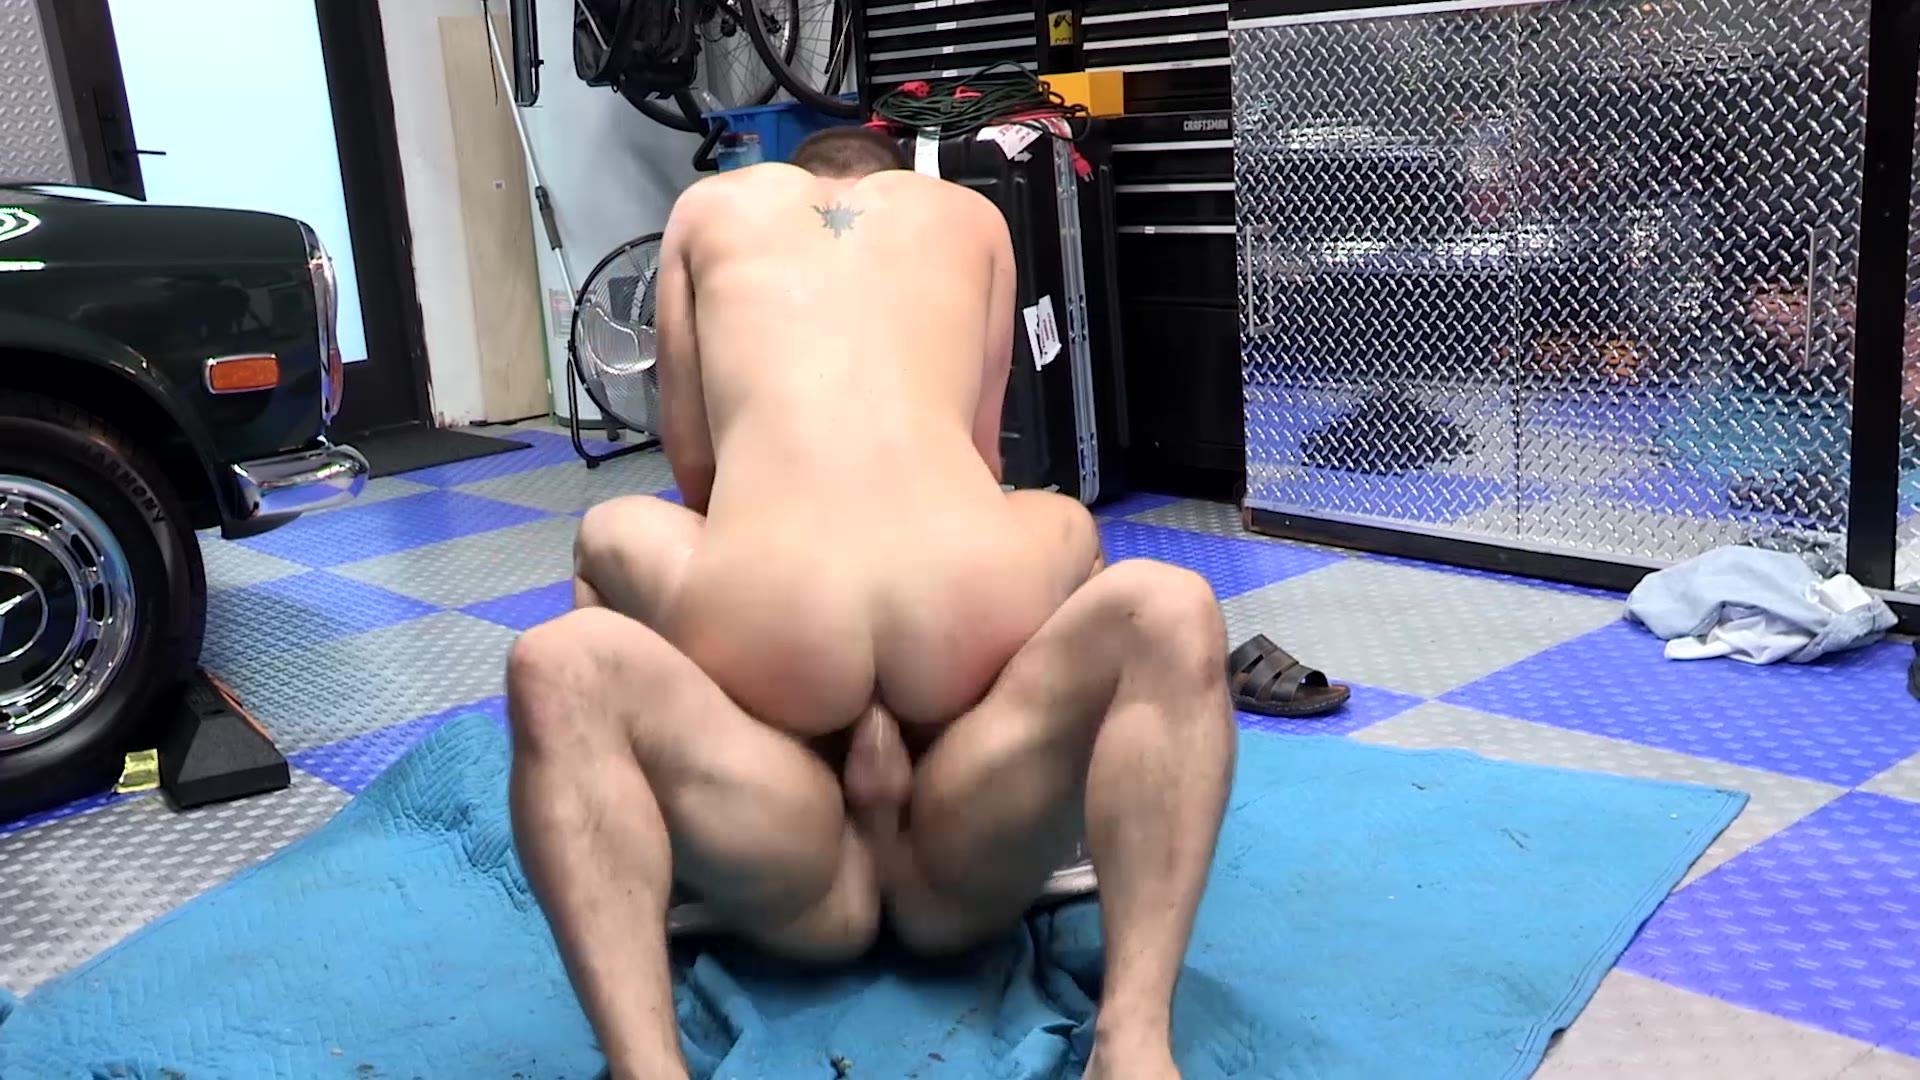 hung gay cum clips